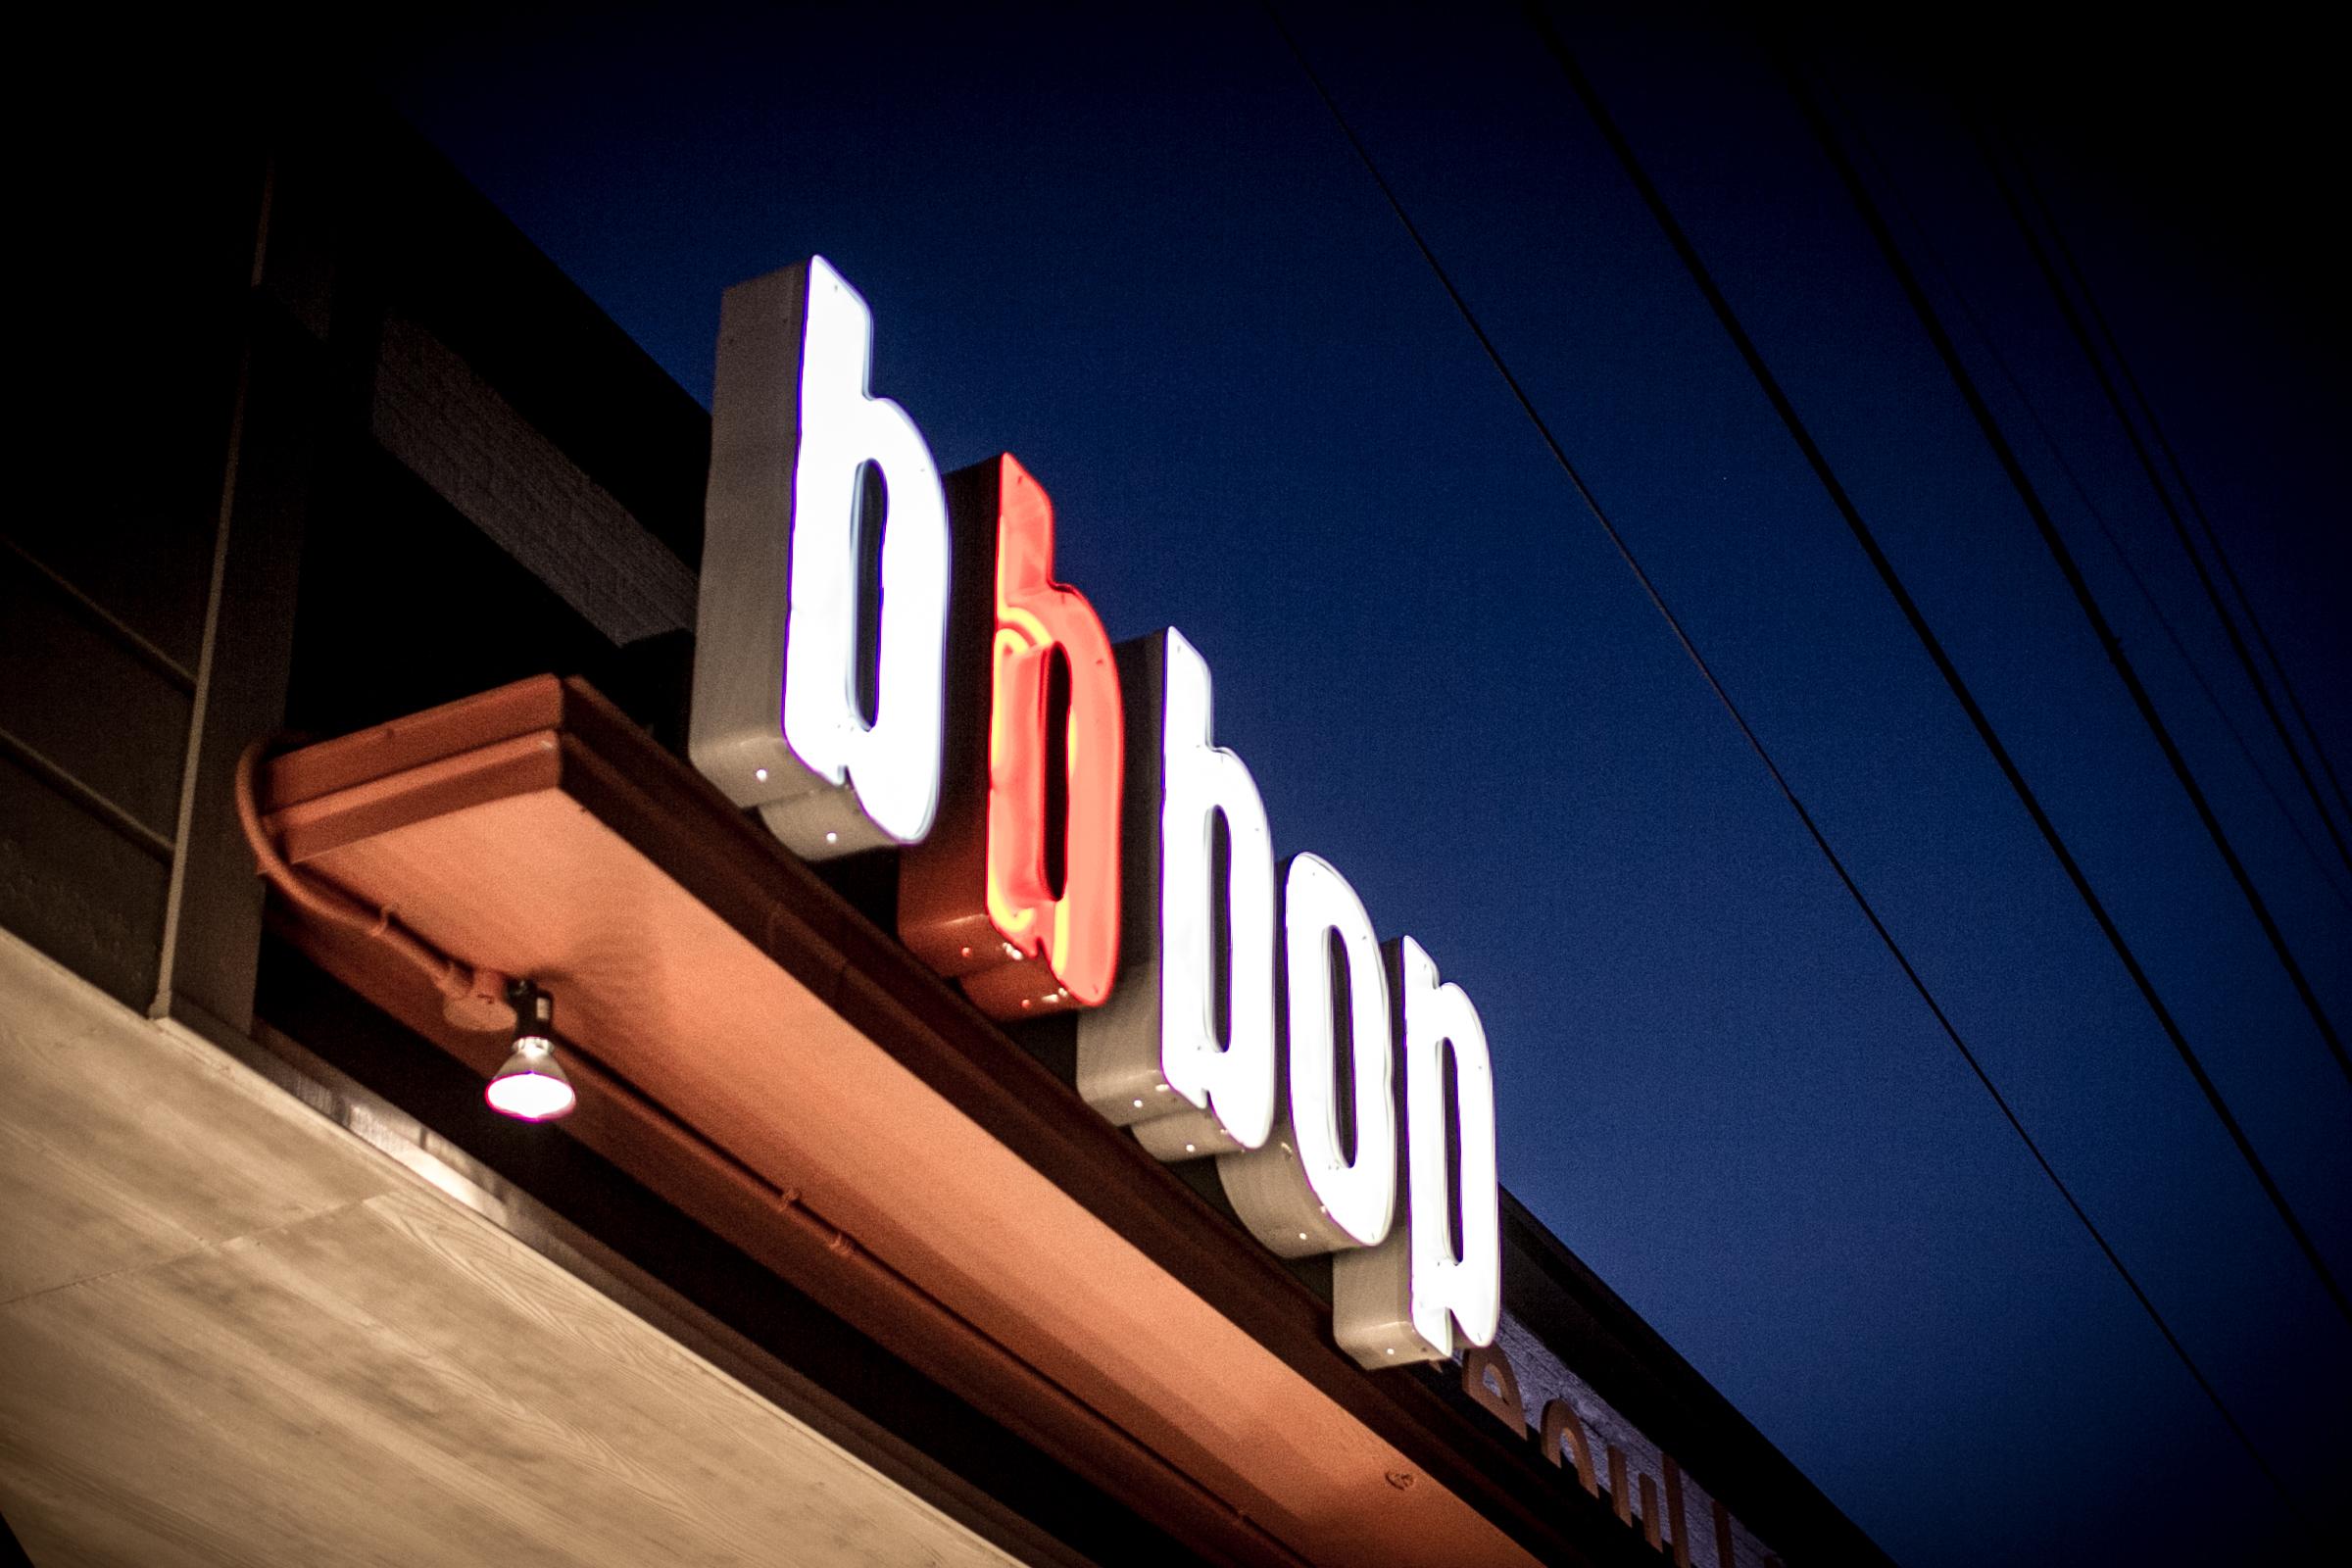 bbbop-oc2-0763.JPG